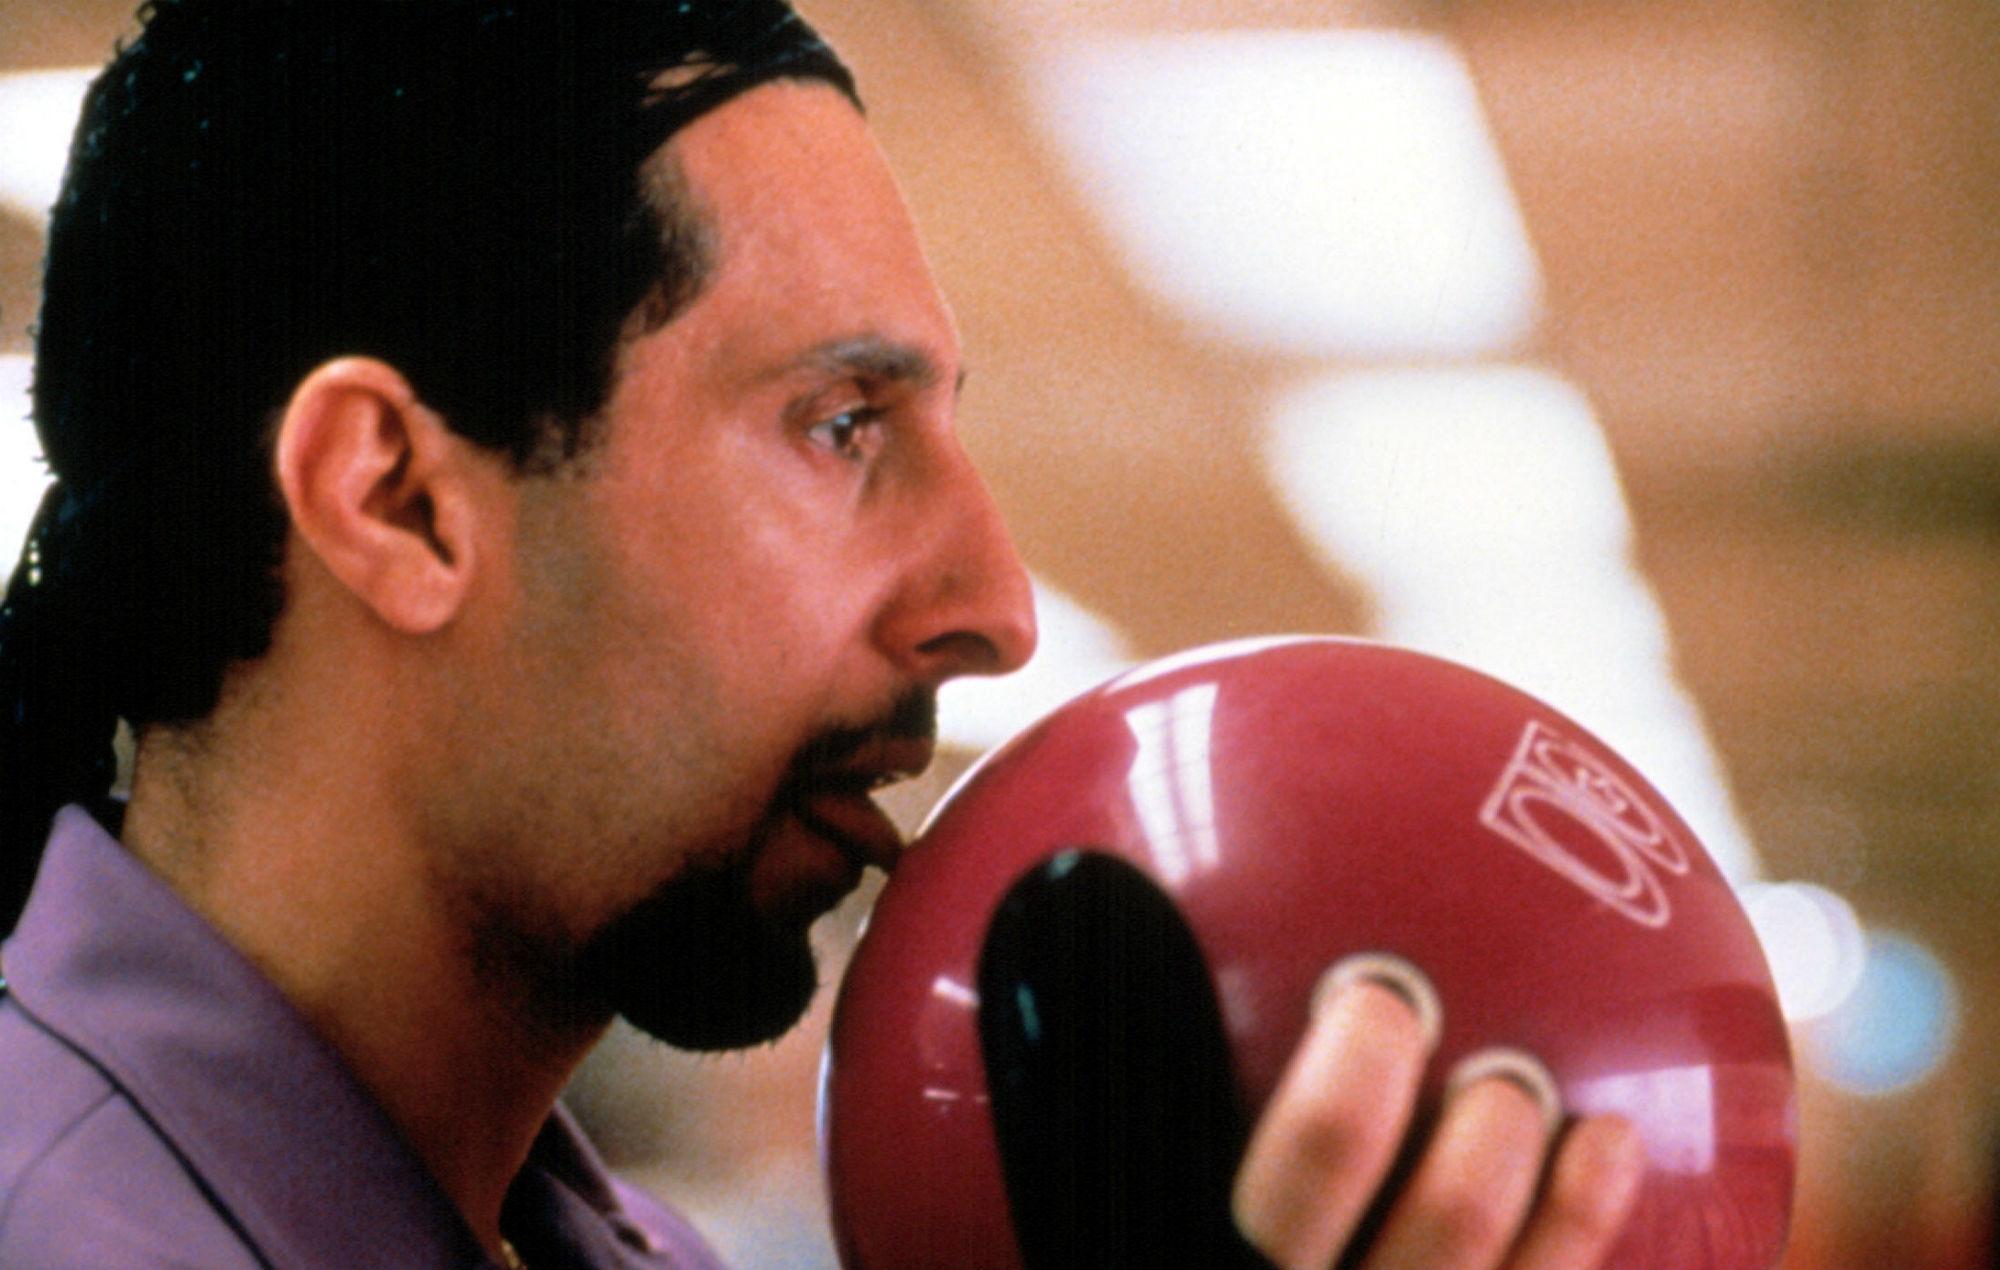 John Turturro in 'The Big Lebowski'